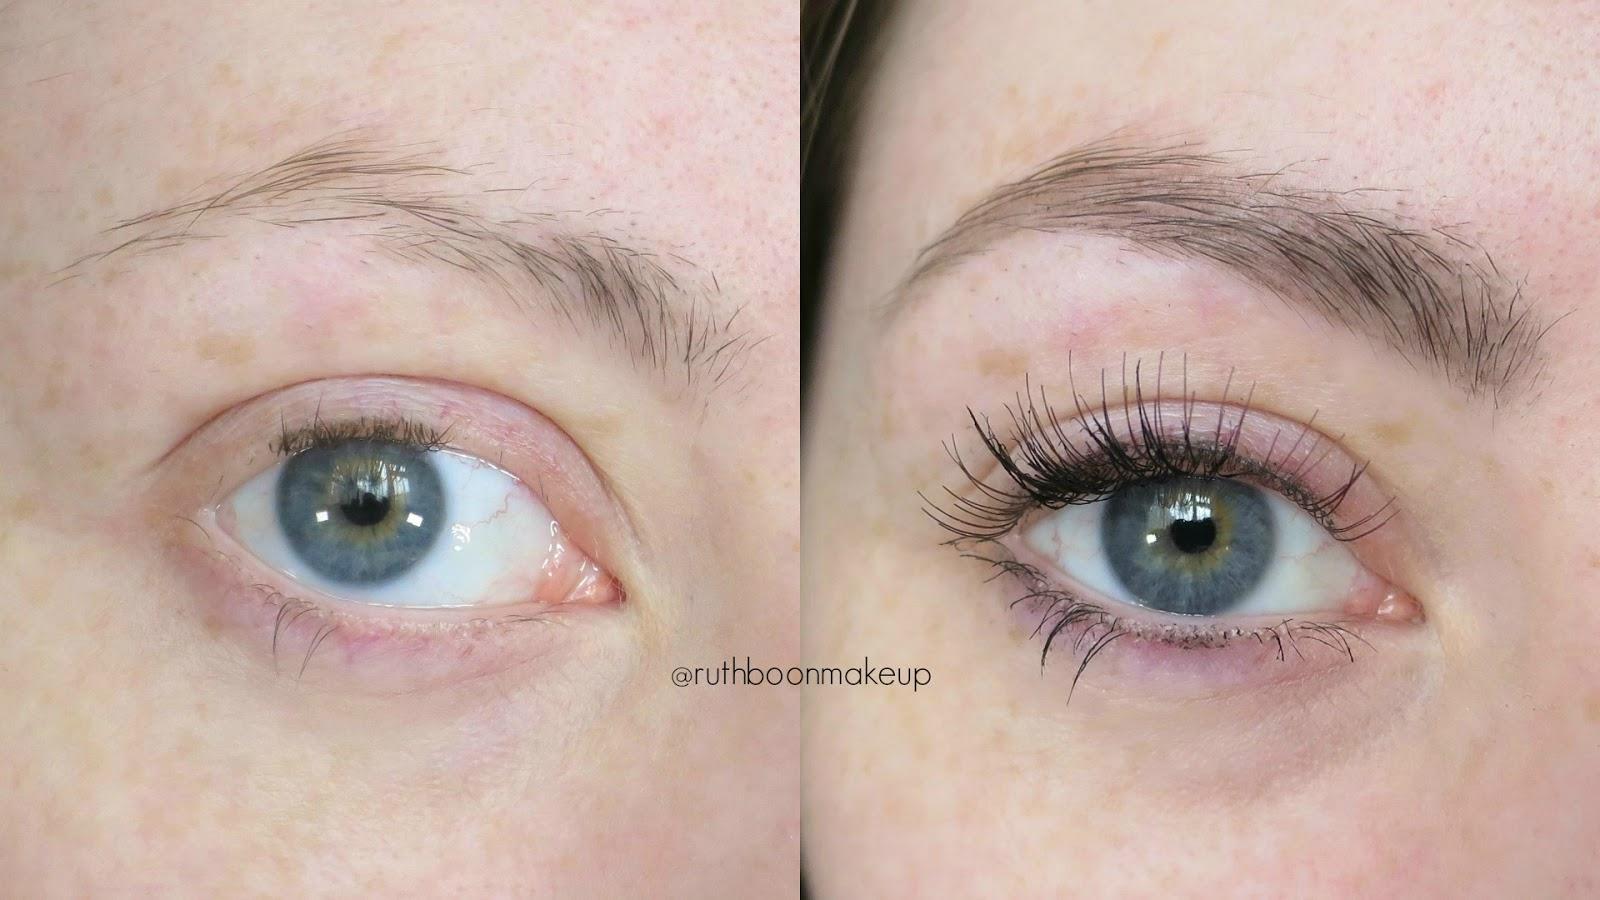 Ruth Boon Makeup For Trichotillomania